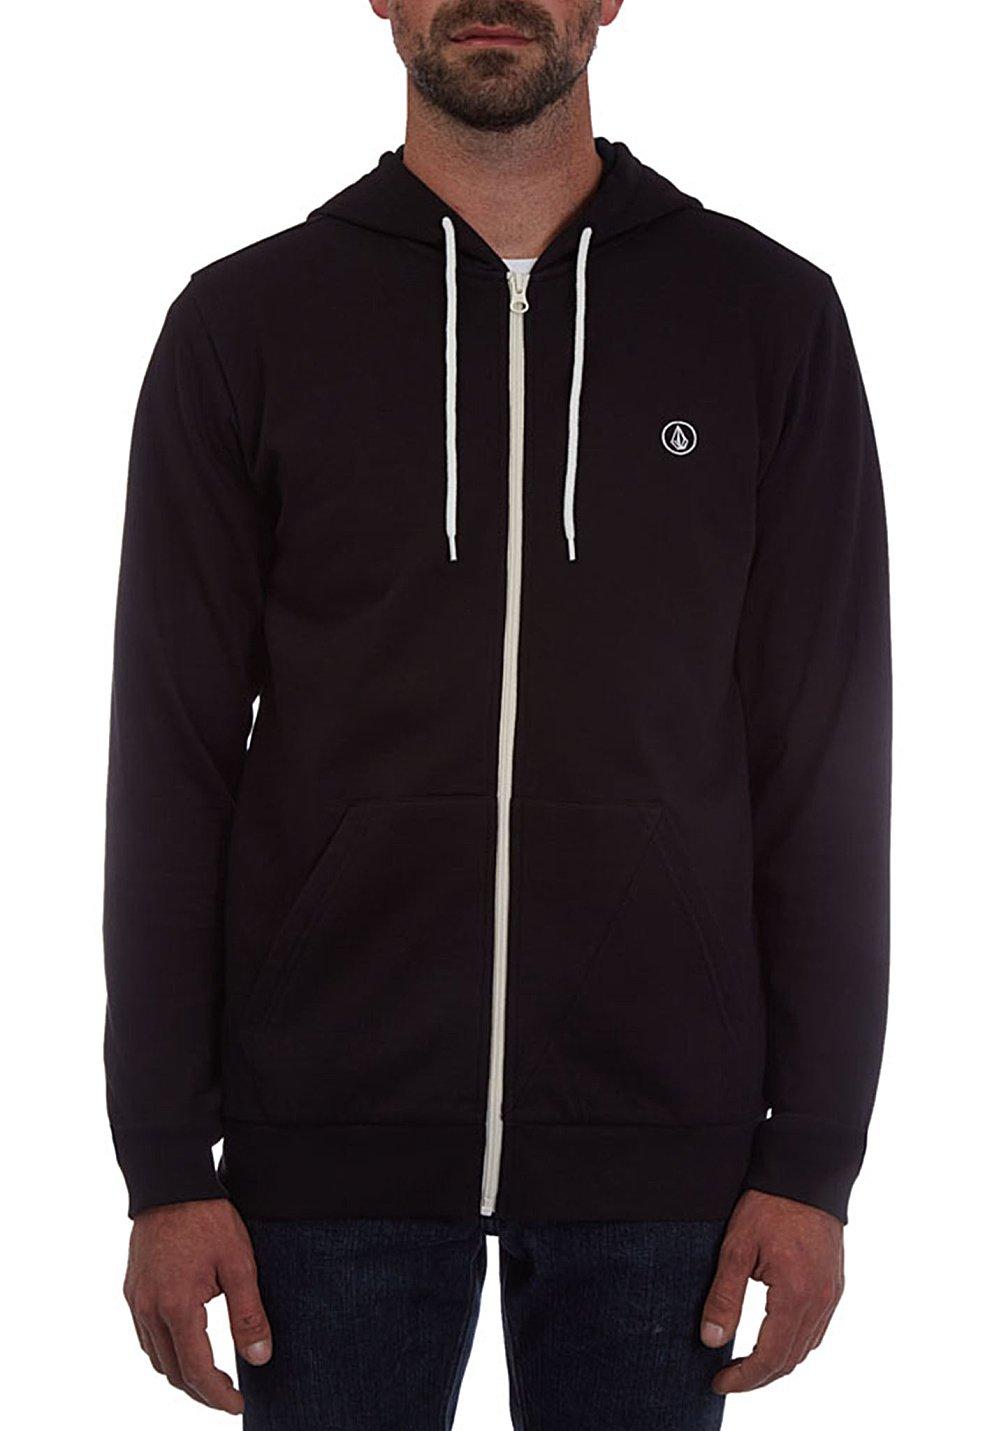 Volcom Herren Icon Zip Hoodie Lightweight Pullover Sweatshirt Kapuzenpulli Reißverschluss Schwarz Kapuzenpullover